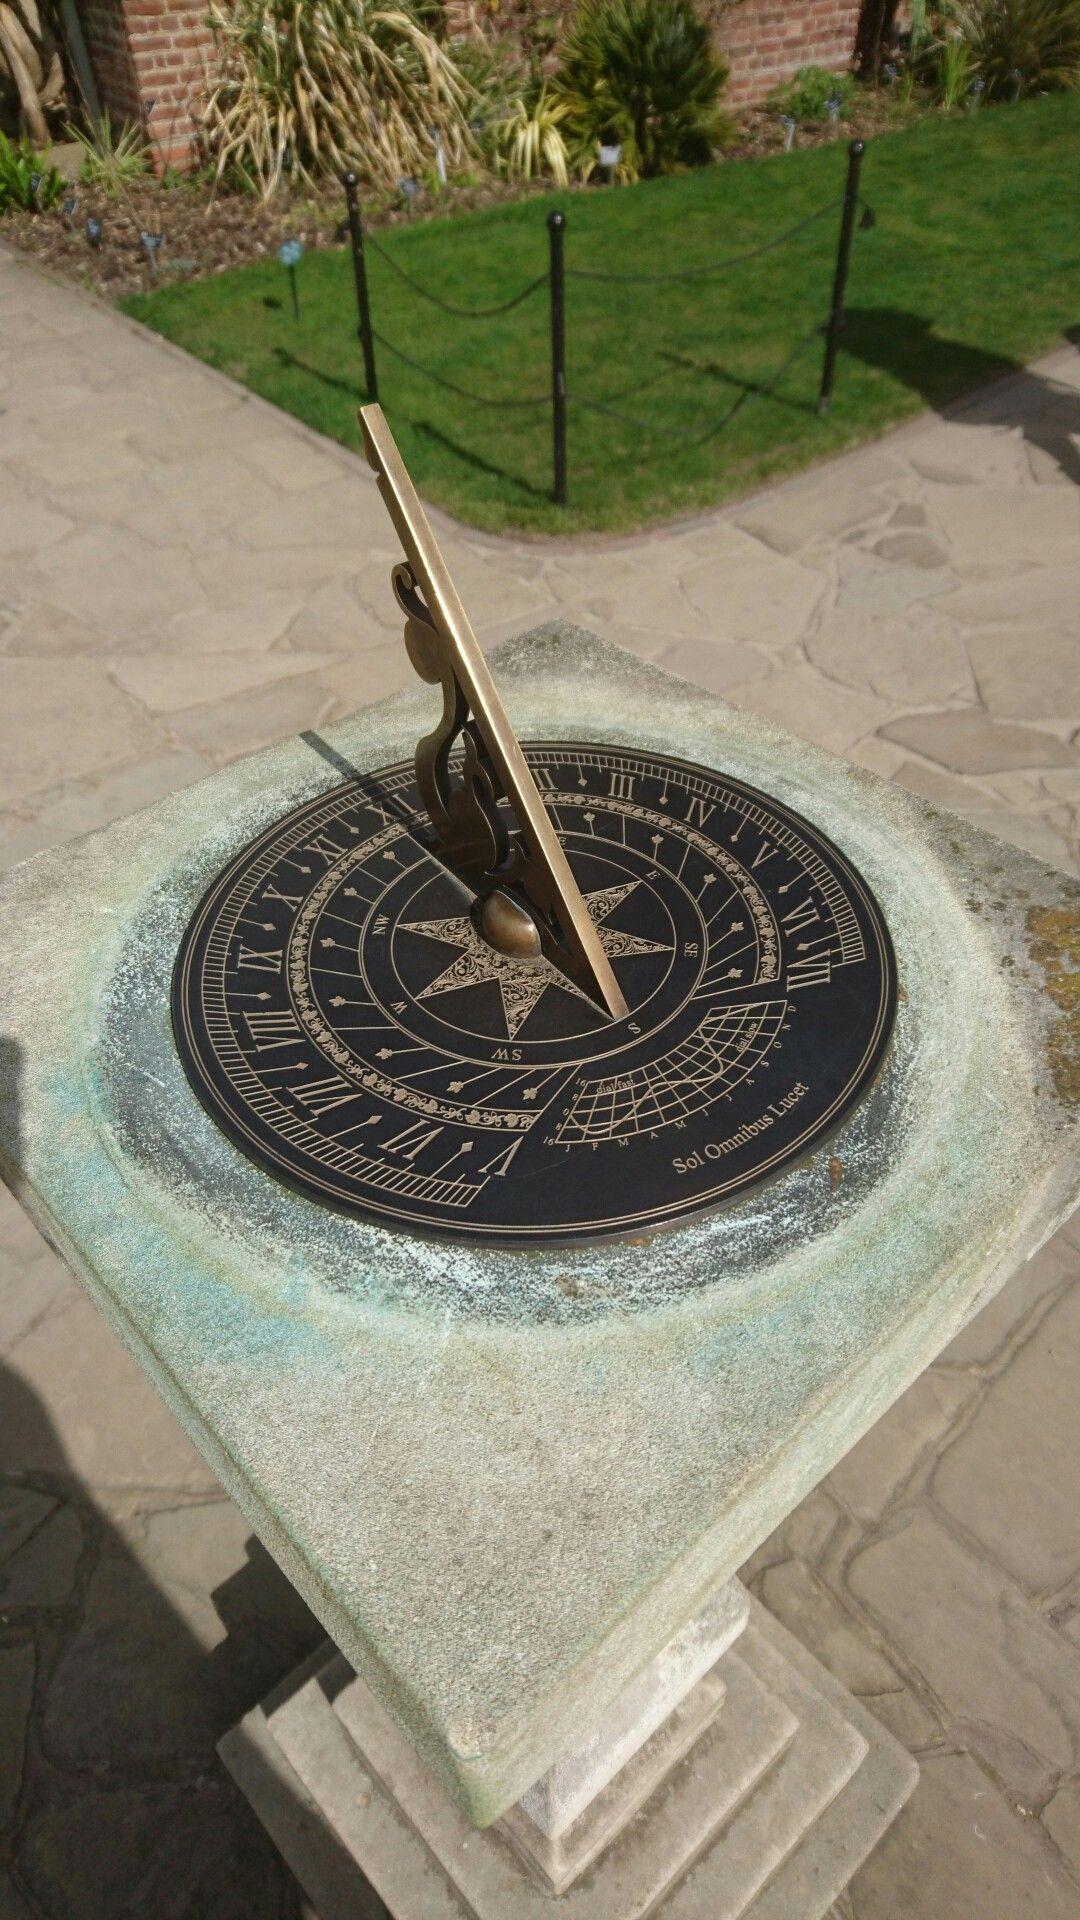 Wisley Gardens Sundial Sundial Outdoor Clock Sundials